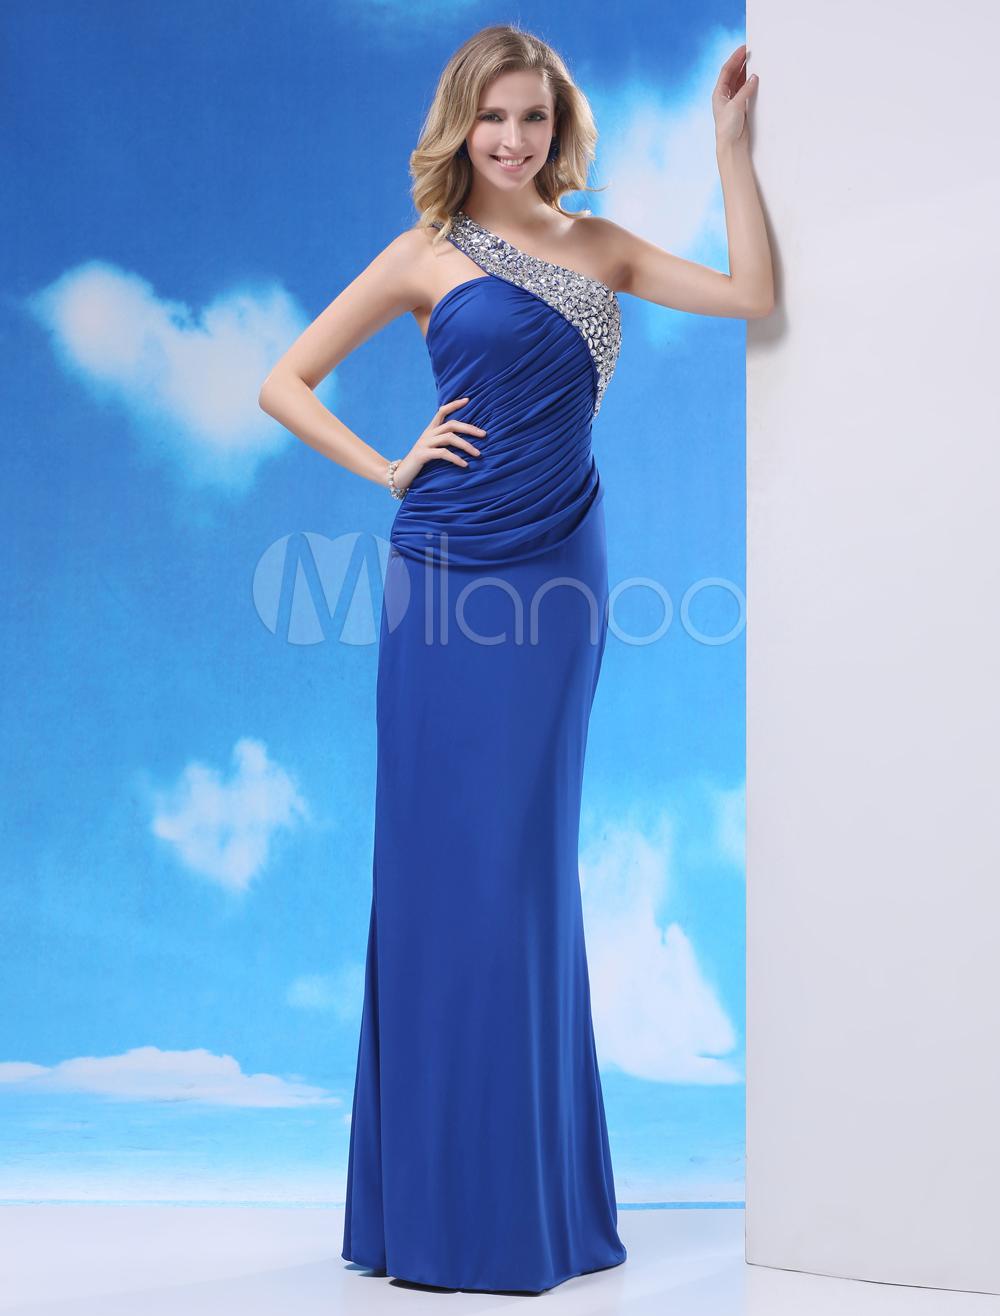 Royal Blue Beading One-Shoulder Elegant Sheath Grace Evening Dress Milanoo (Wedding Evening Dresses) photo